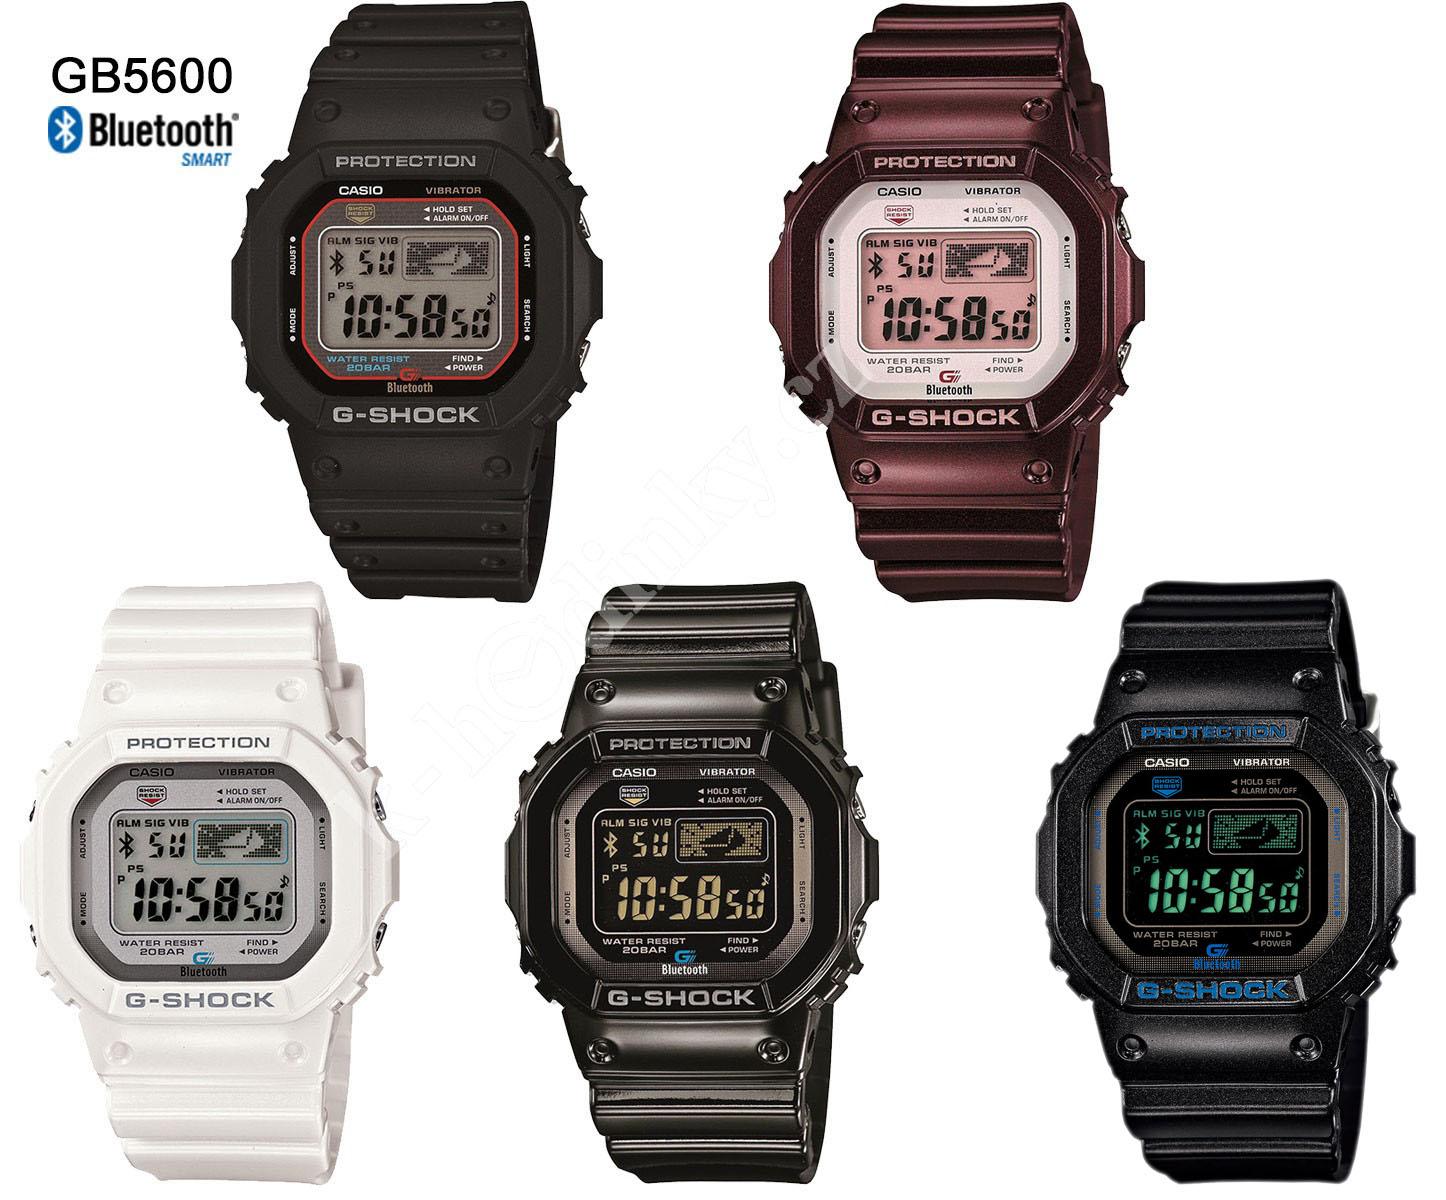 Hodinky Casio G-Shock GB 5600AA-1A Bluetooth - Hodinky Casio a Citizen 3b1cb4628c6